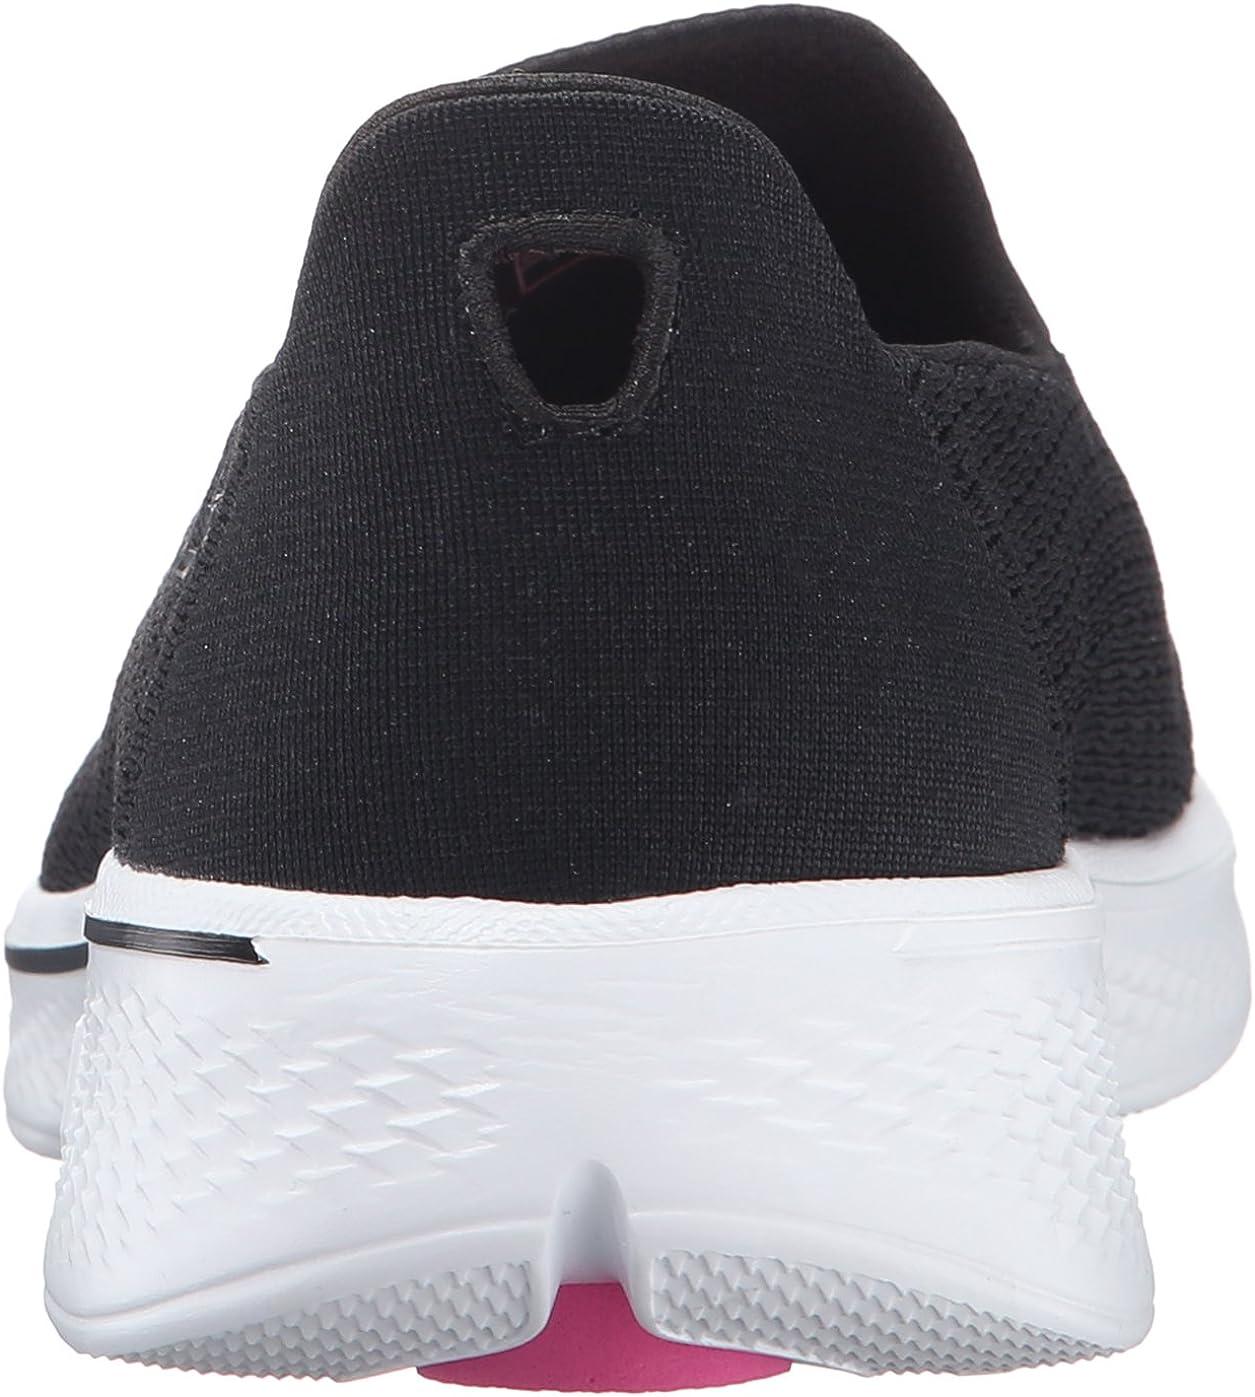 Women's Go Walk 4 Pursuit Low Top Sneakers, , B(M) US, ( )